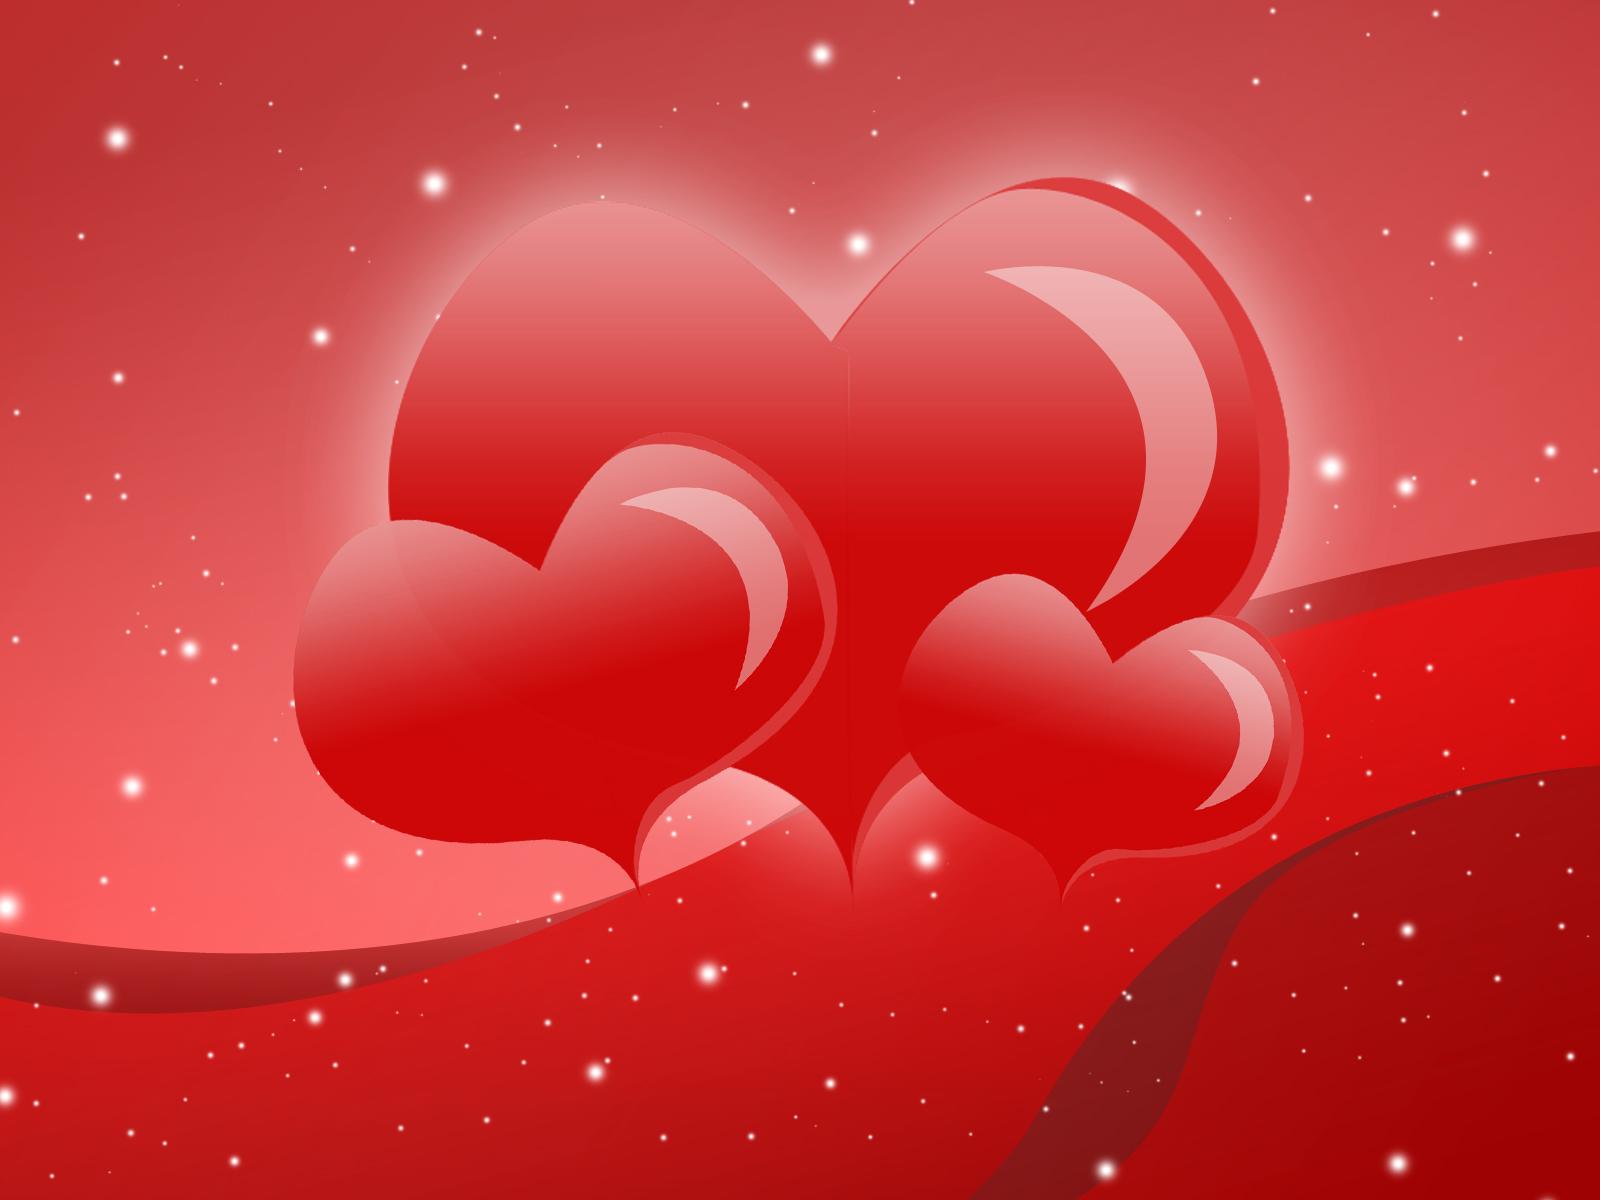 Cute Valentine Background wallpaper 1920x1200 26366 1600x1200